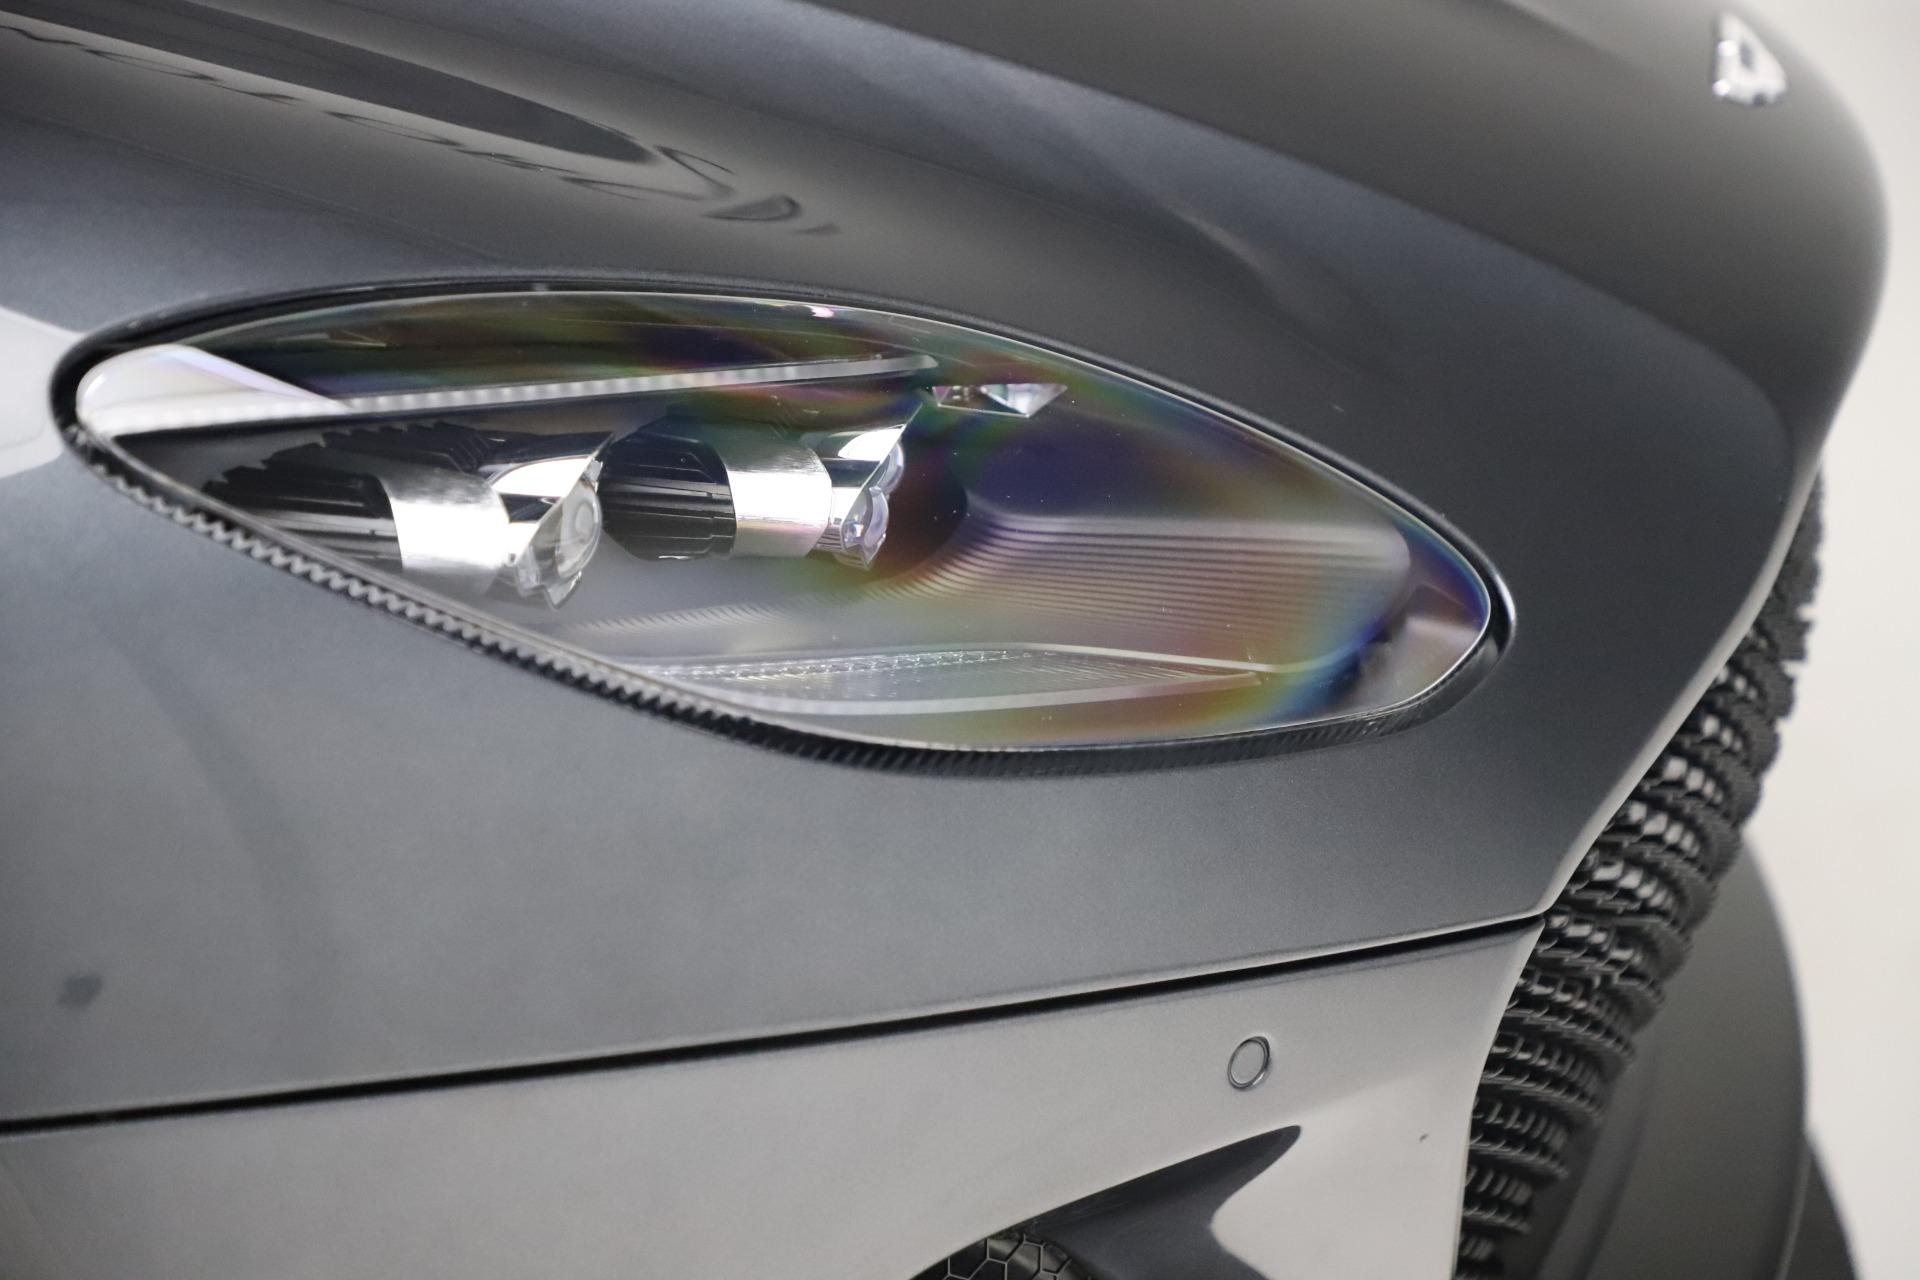 Used 2019 Aston Martin DBS Superleggera Coupe For Sale In Greenwich, CT. Alfa Romeo of Greenwich, A1438B 3570_p29